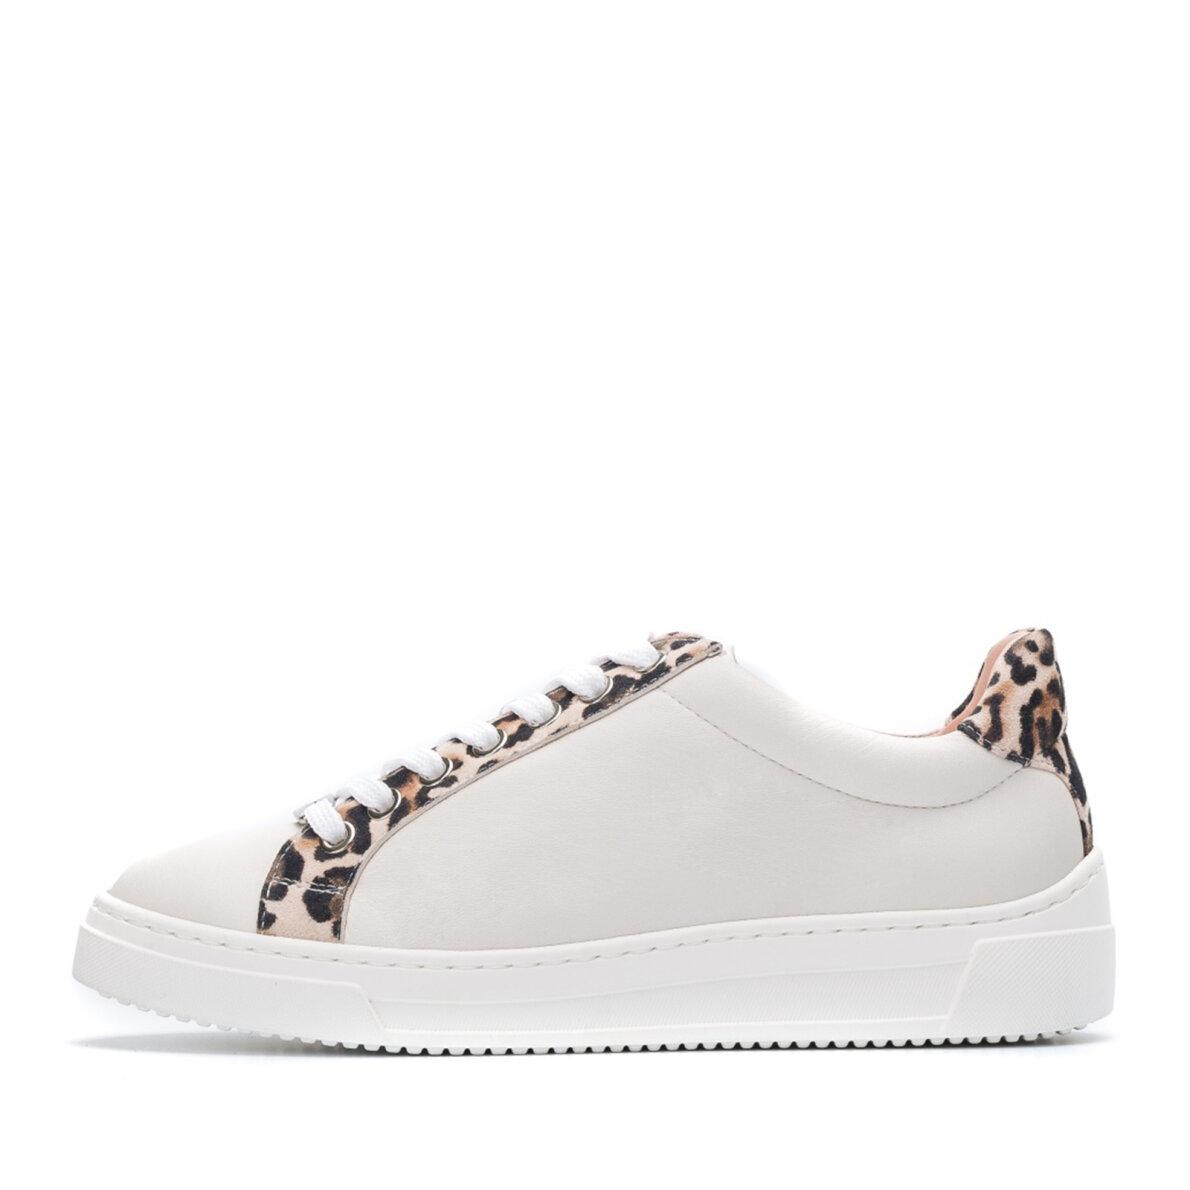 3f56d755 Unisa Franci - Beige dame sneaker med leopard print - Piedi.dk